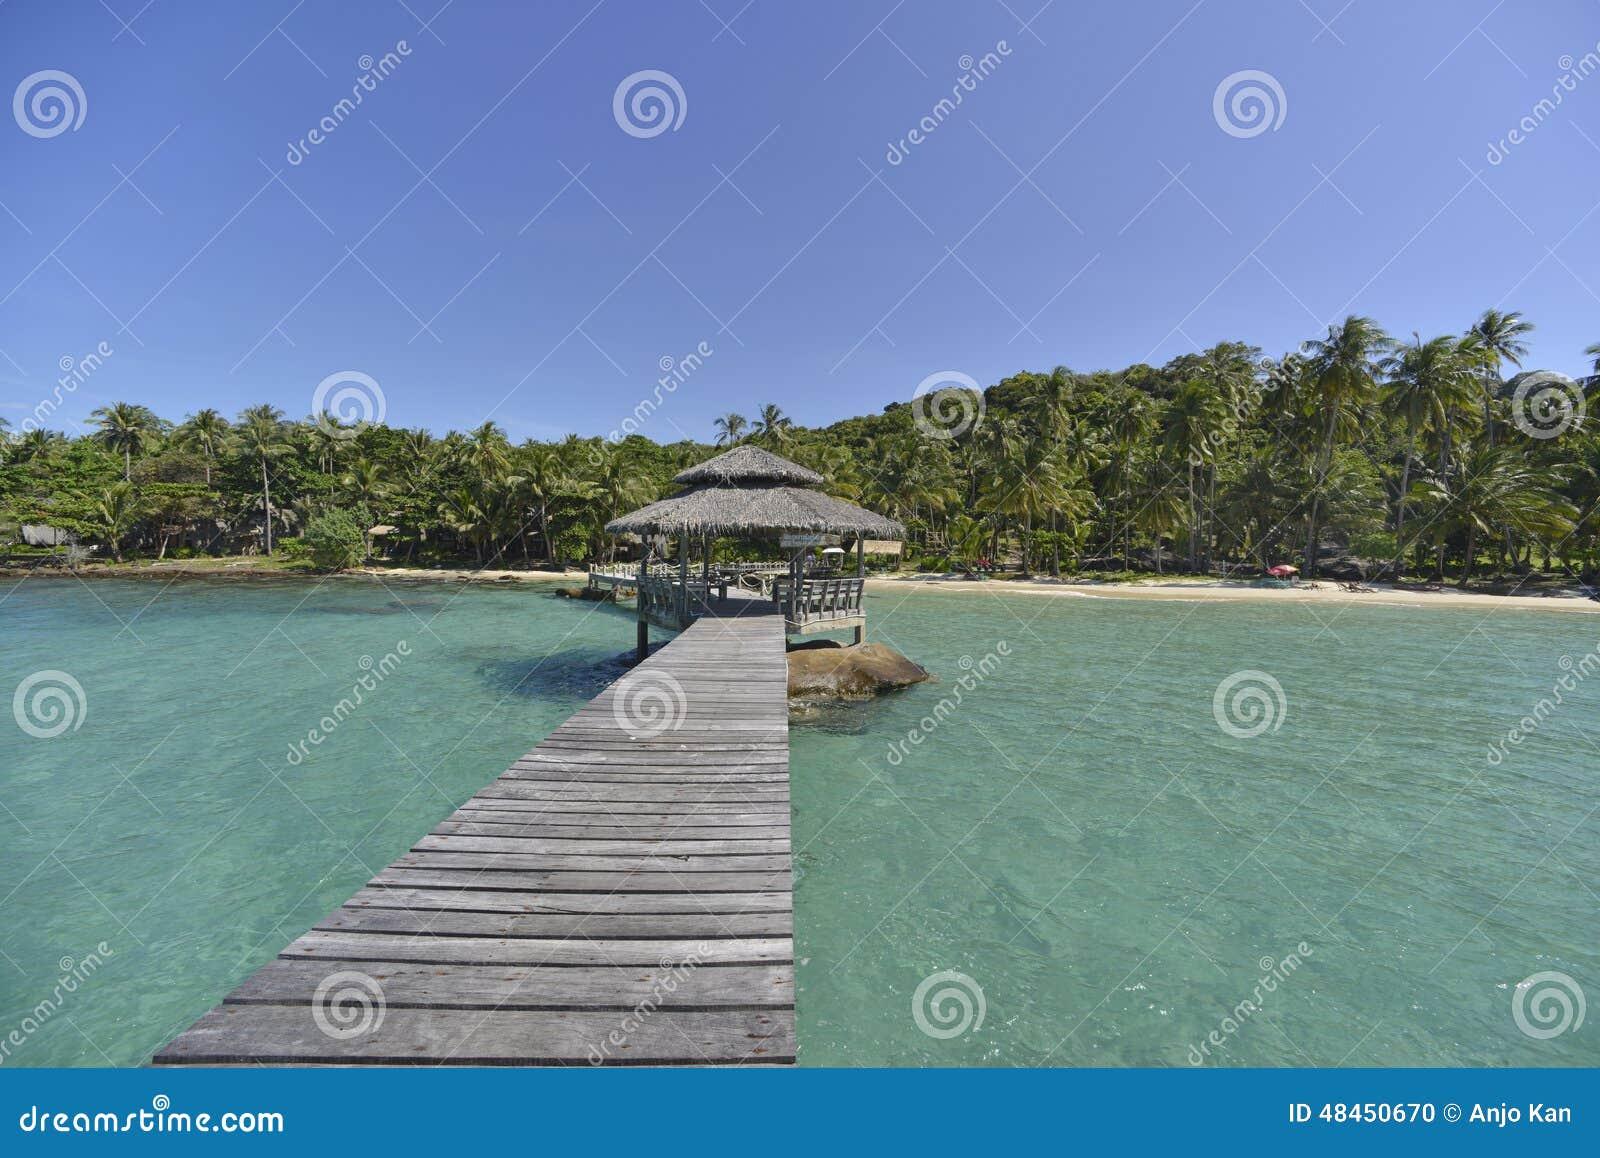 Wooden bridge at sunny day